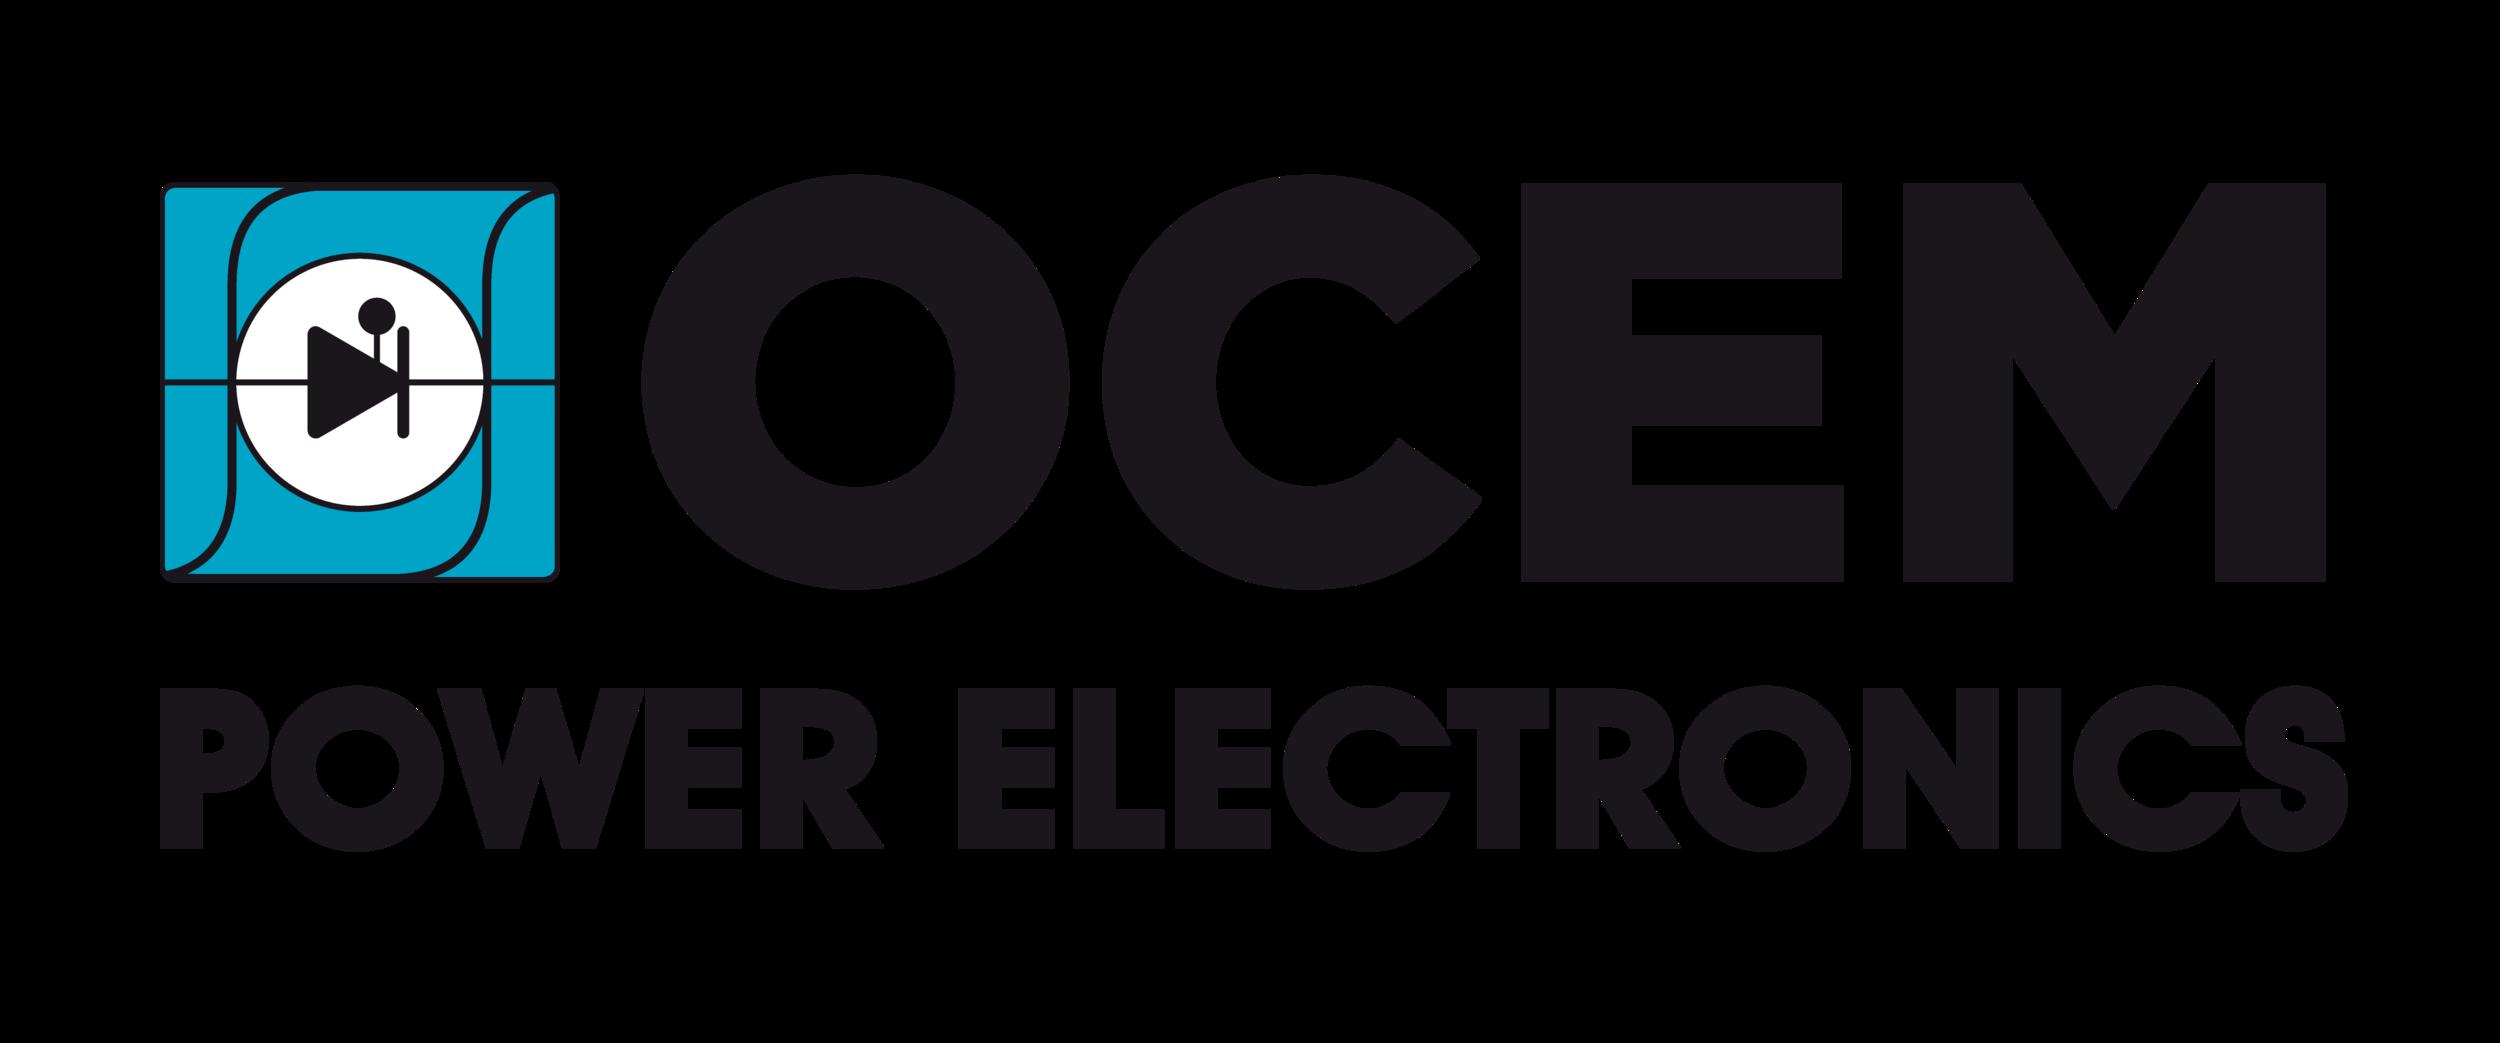 Power-Electronics-Logo-TRUE-s.png